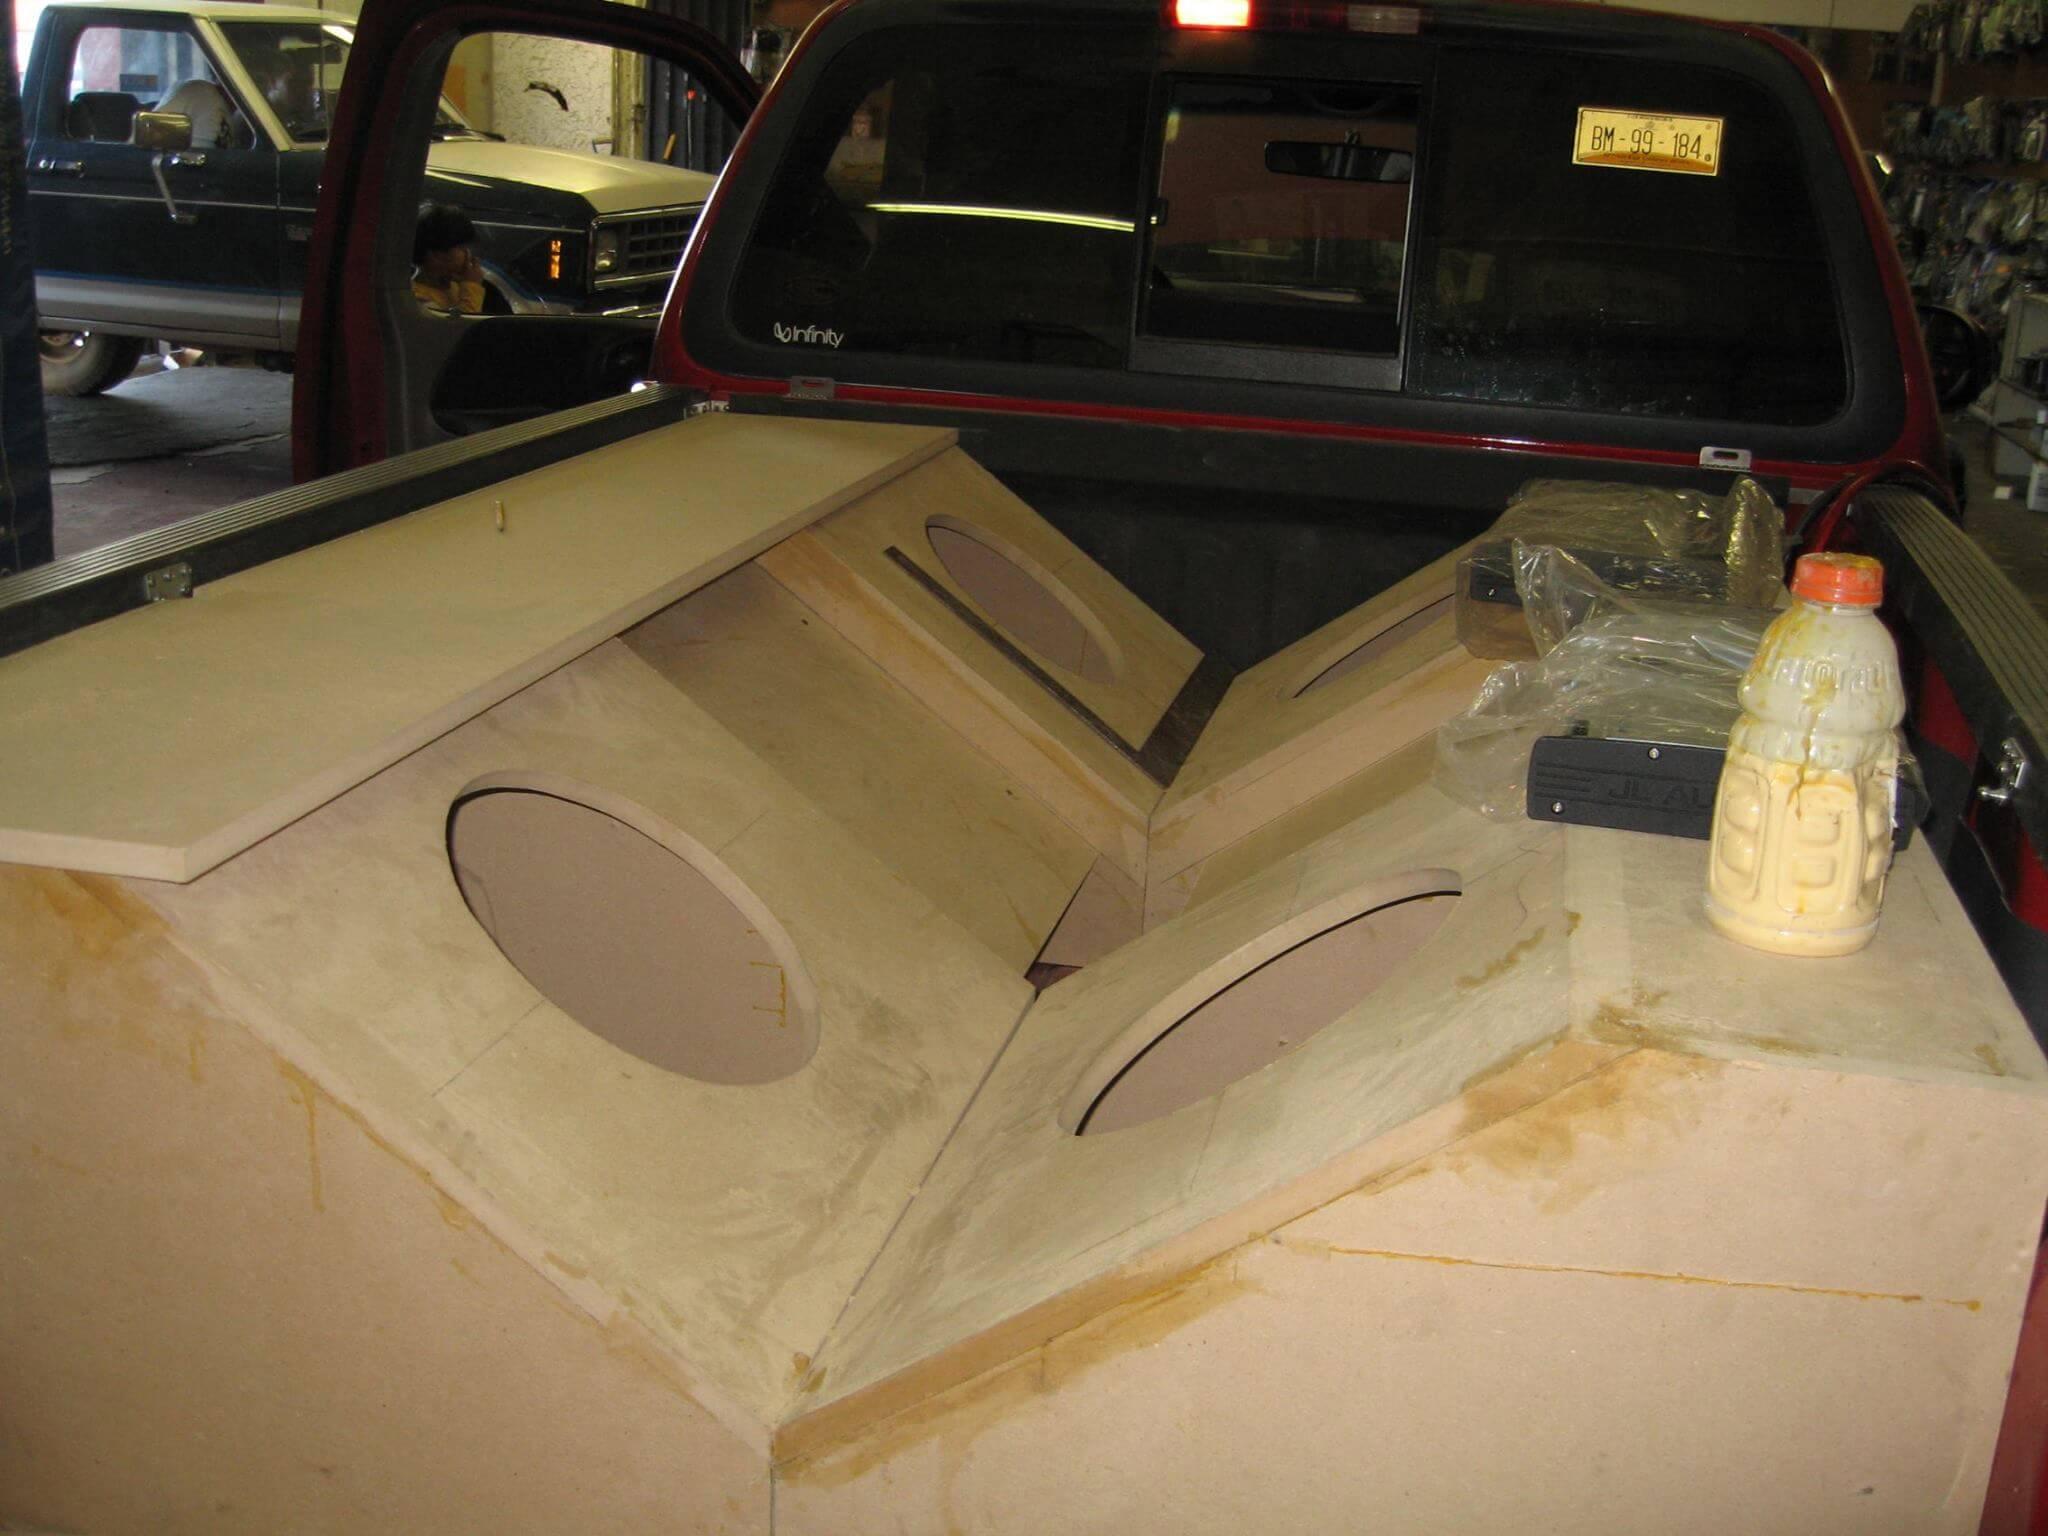 Best Custom Car Audio in San Diego & El Cajon at Stereo Depot